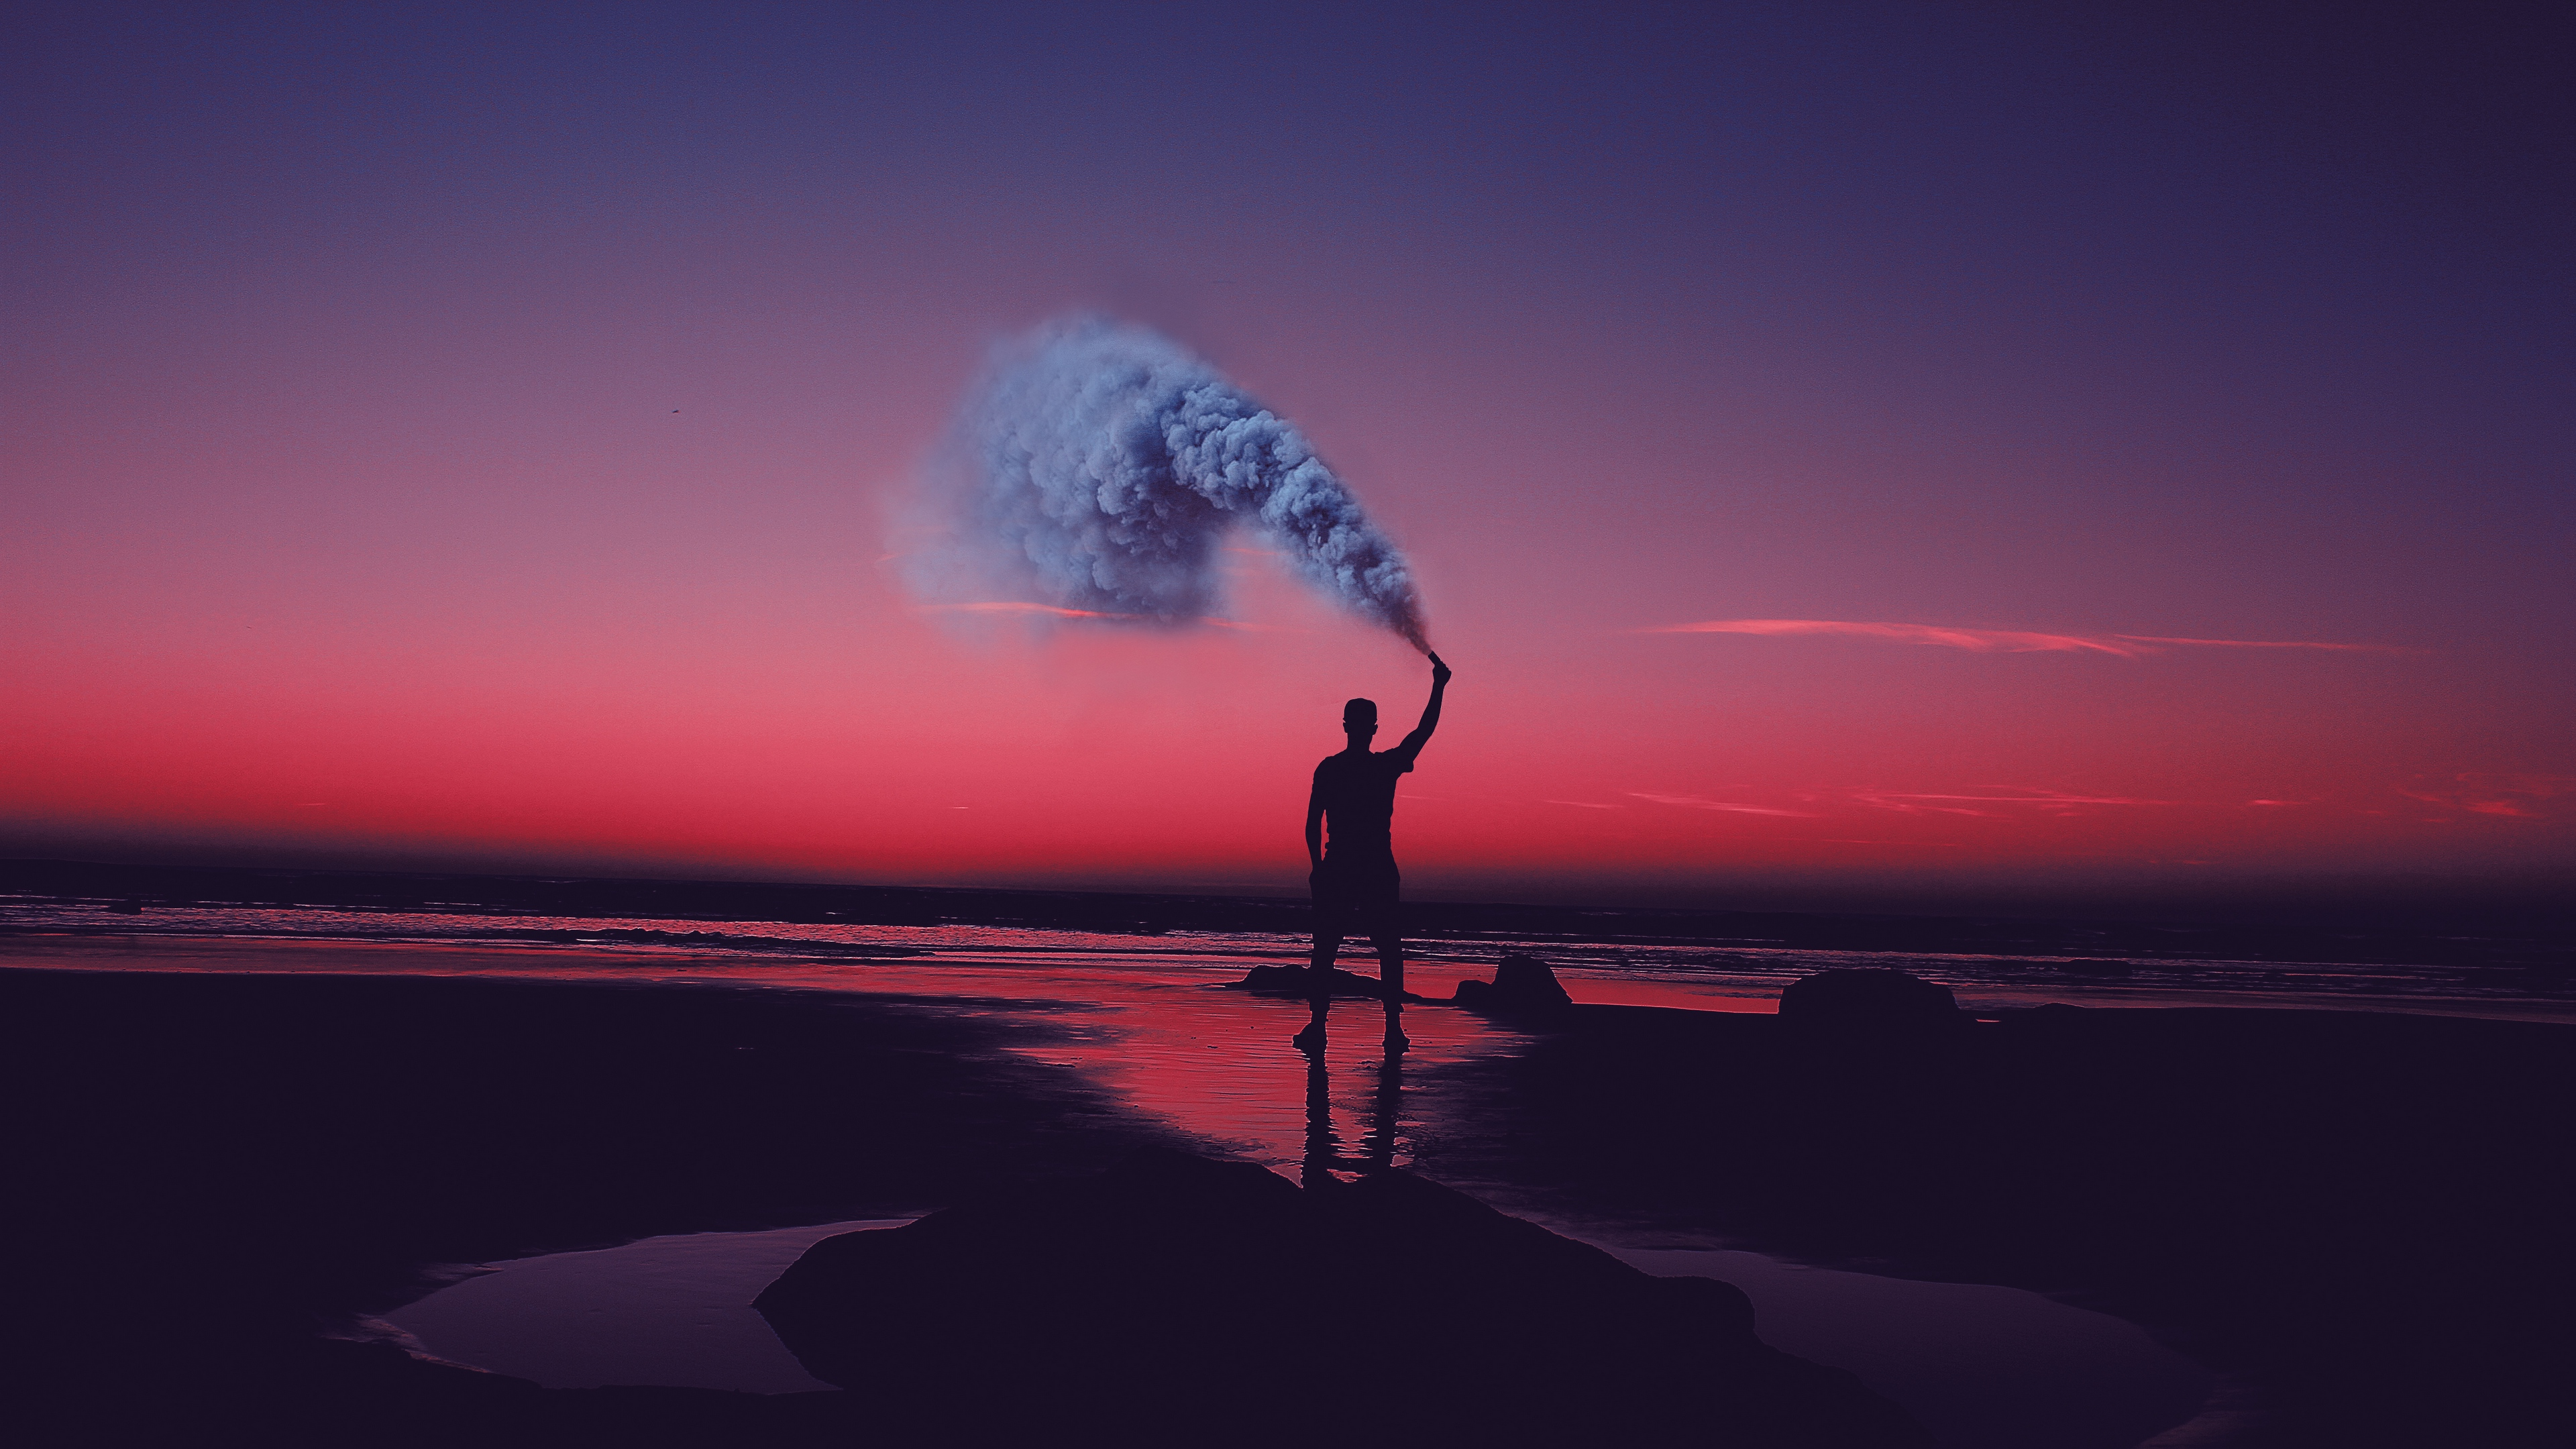 Wallpaper 4k Smoke Bombs Smoke Flare Shore Sunset 4k